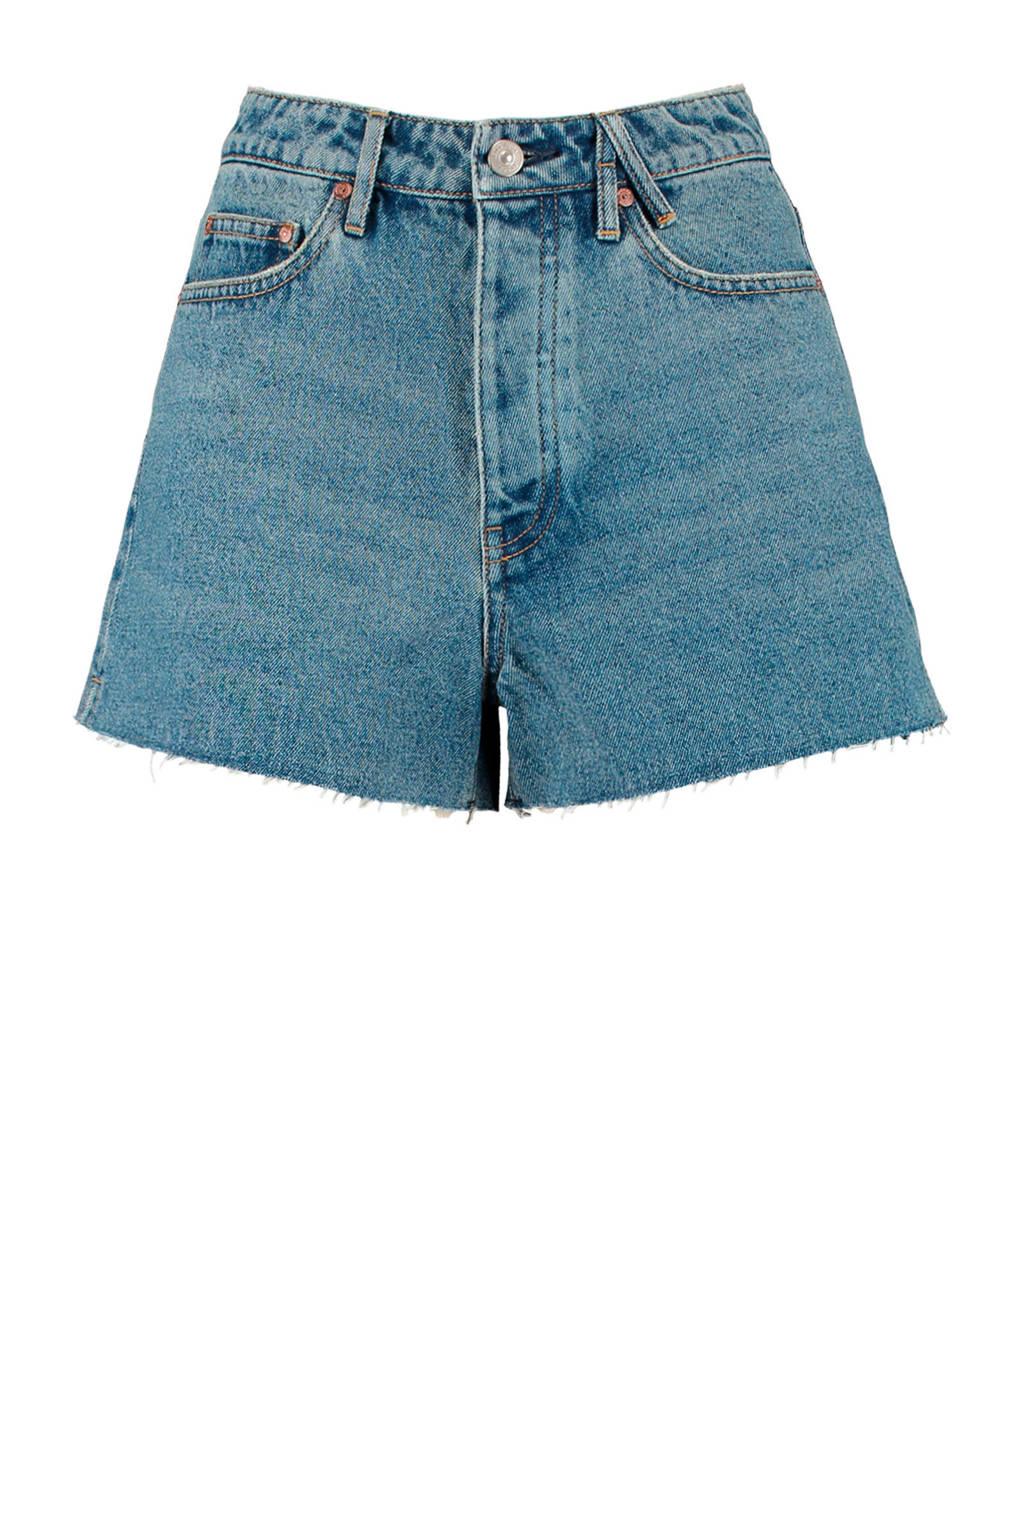 America Today high waist jeans short Jadan vintage blue, Vintage blue